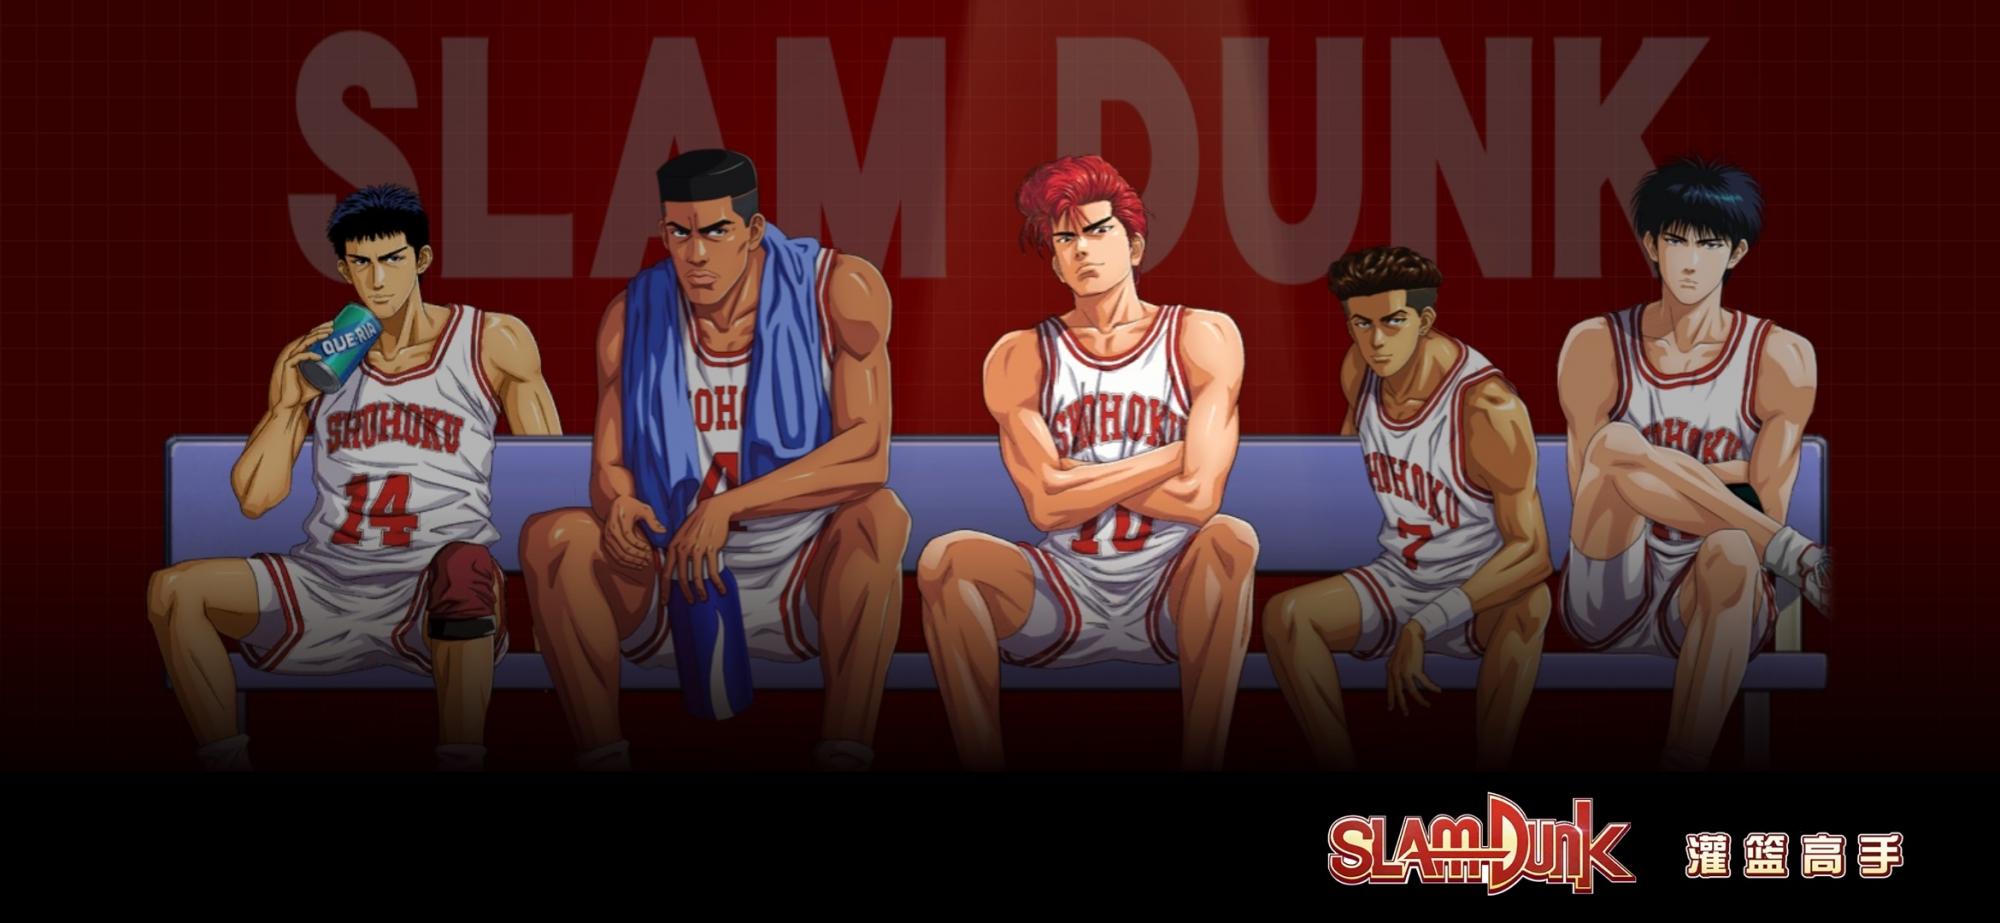 SlamdunkLite.jpg